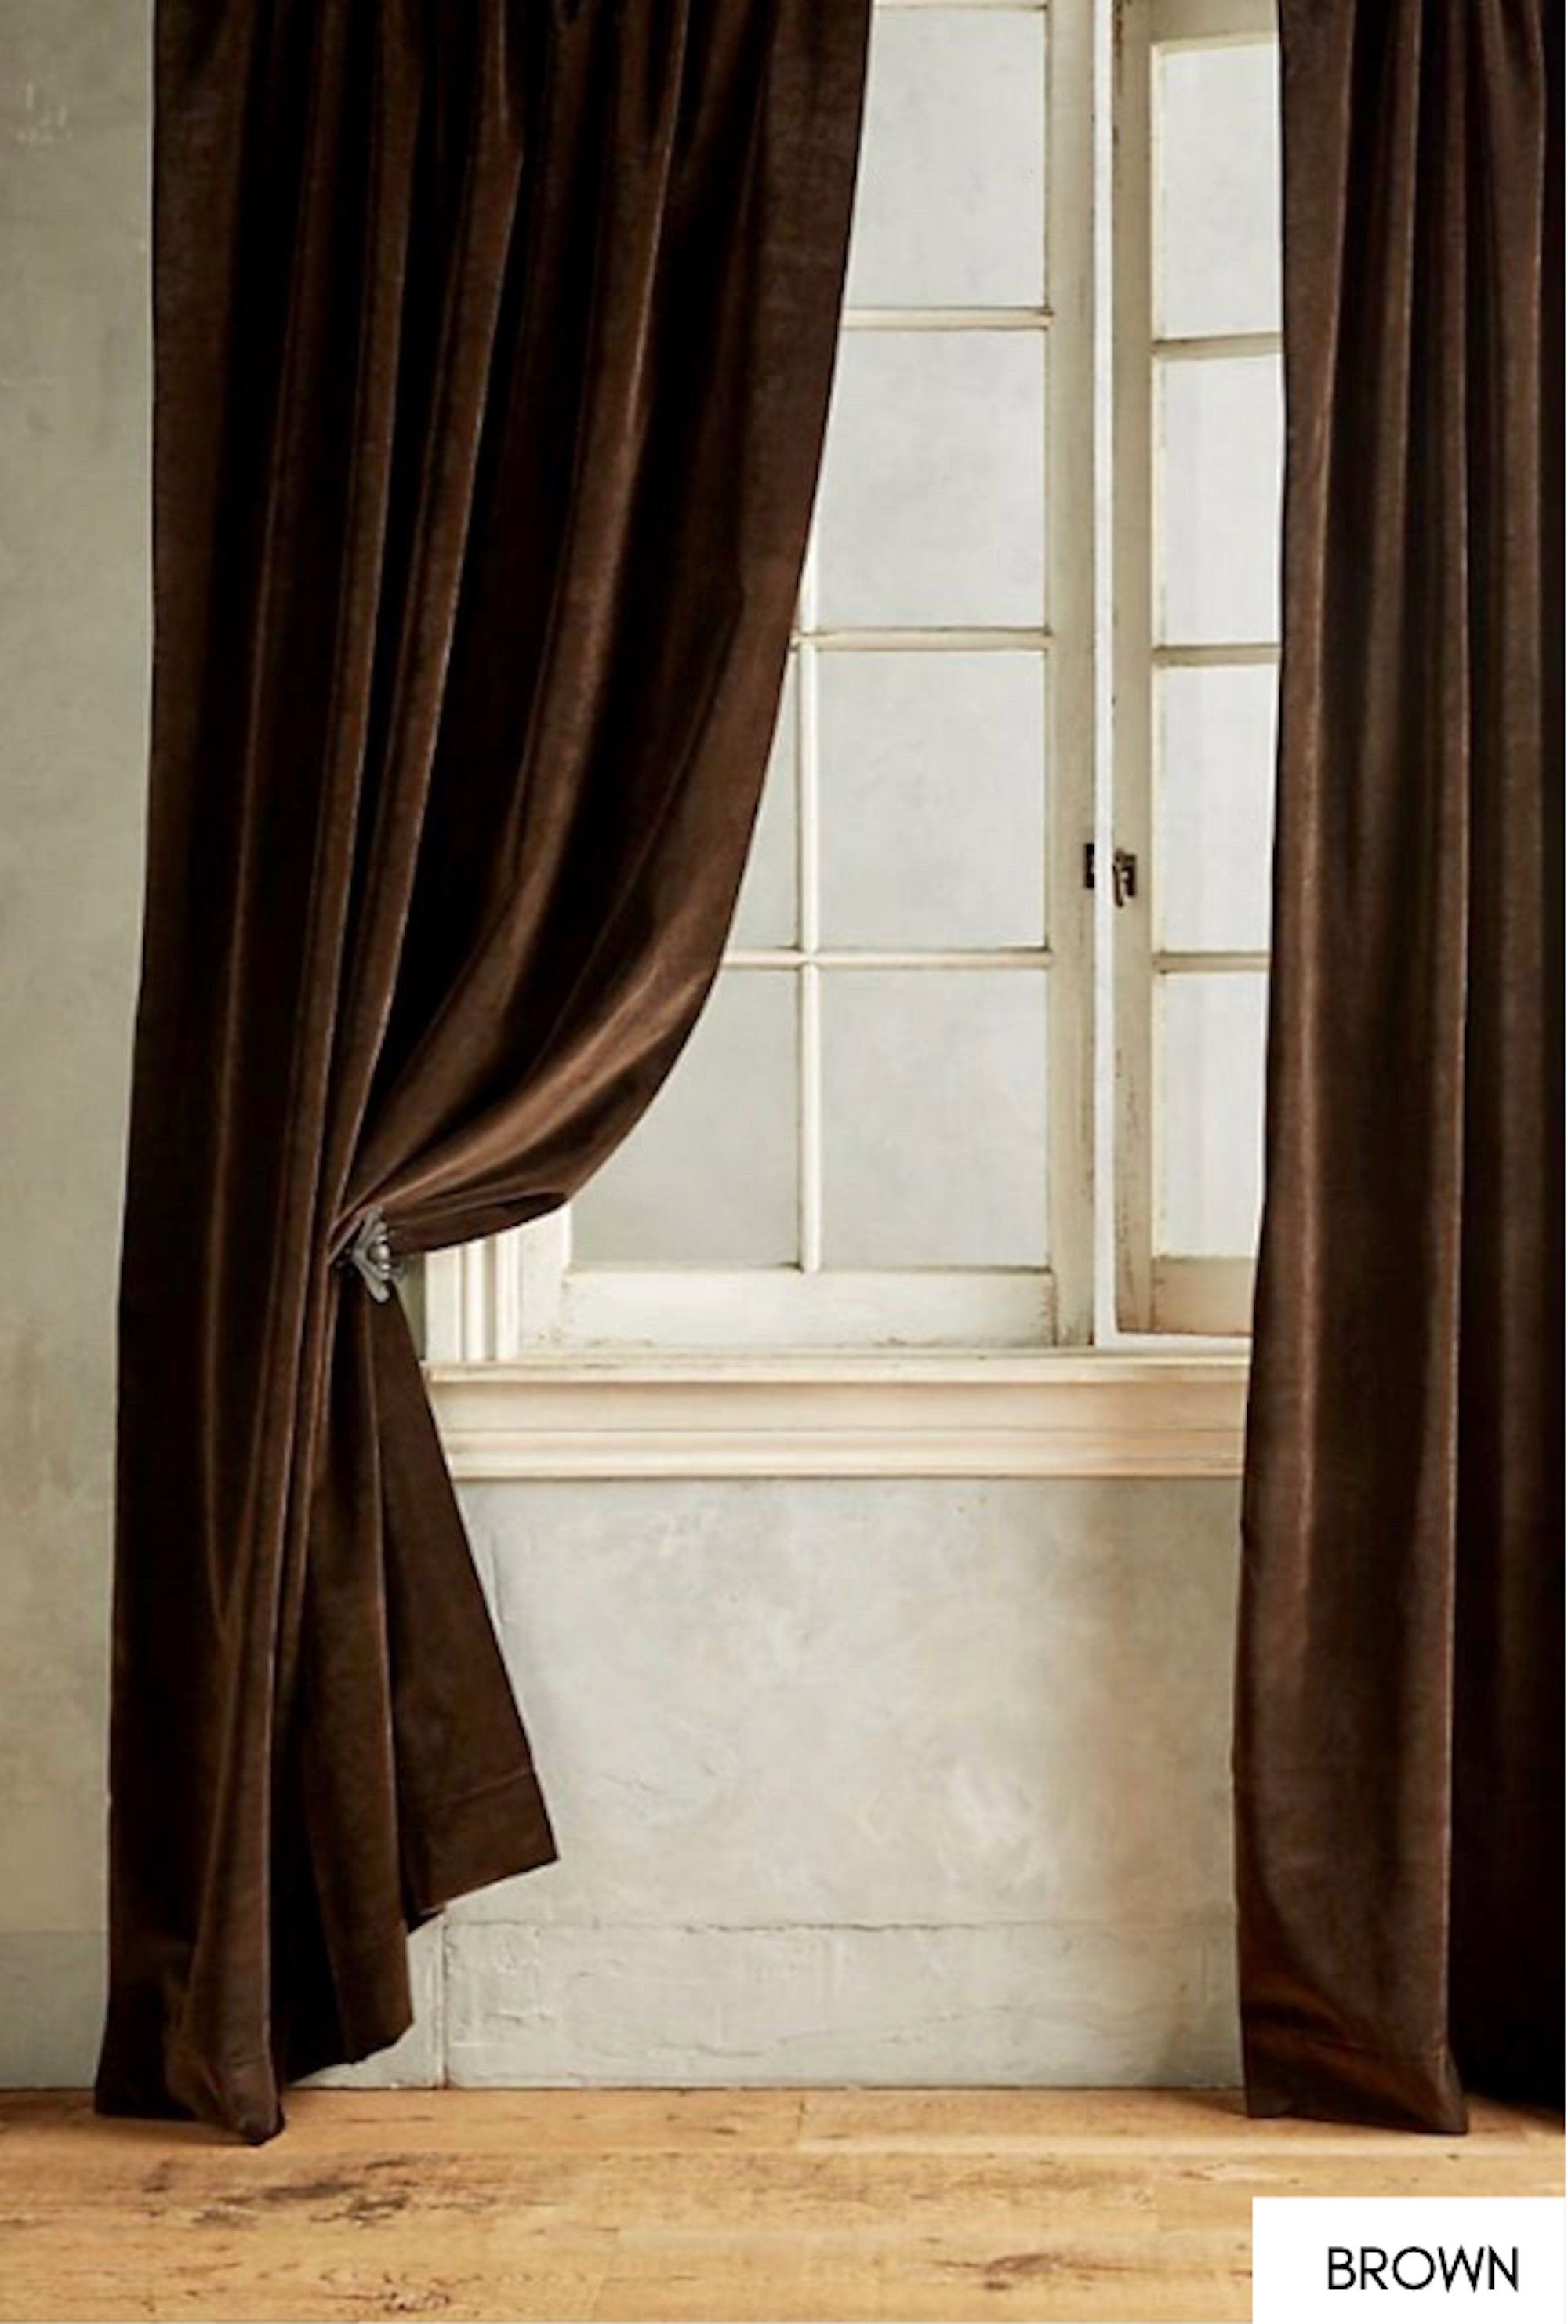 Velvet Curtains Custom Window Curtain Panels Curtain Panels Blackout Curtains Dining Room Curtains Curtains Curtains For Living Room In 2020 Dining Room Curtains Panel Curtains Curtains Living Room #thermal #curtains #for #living #room